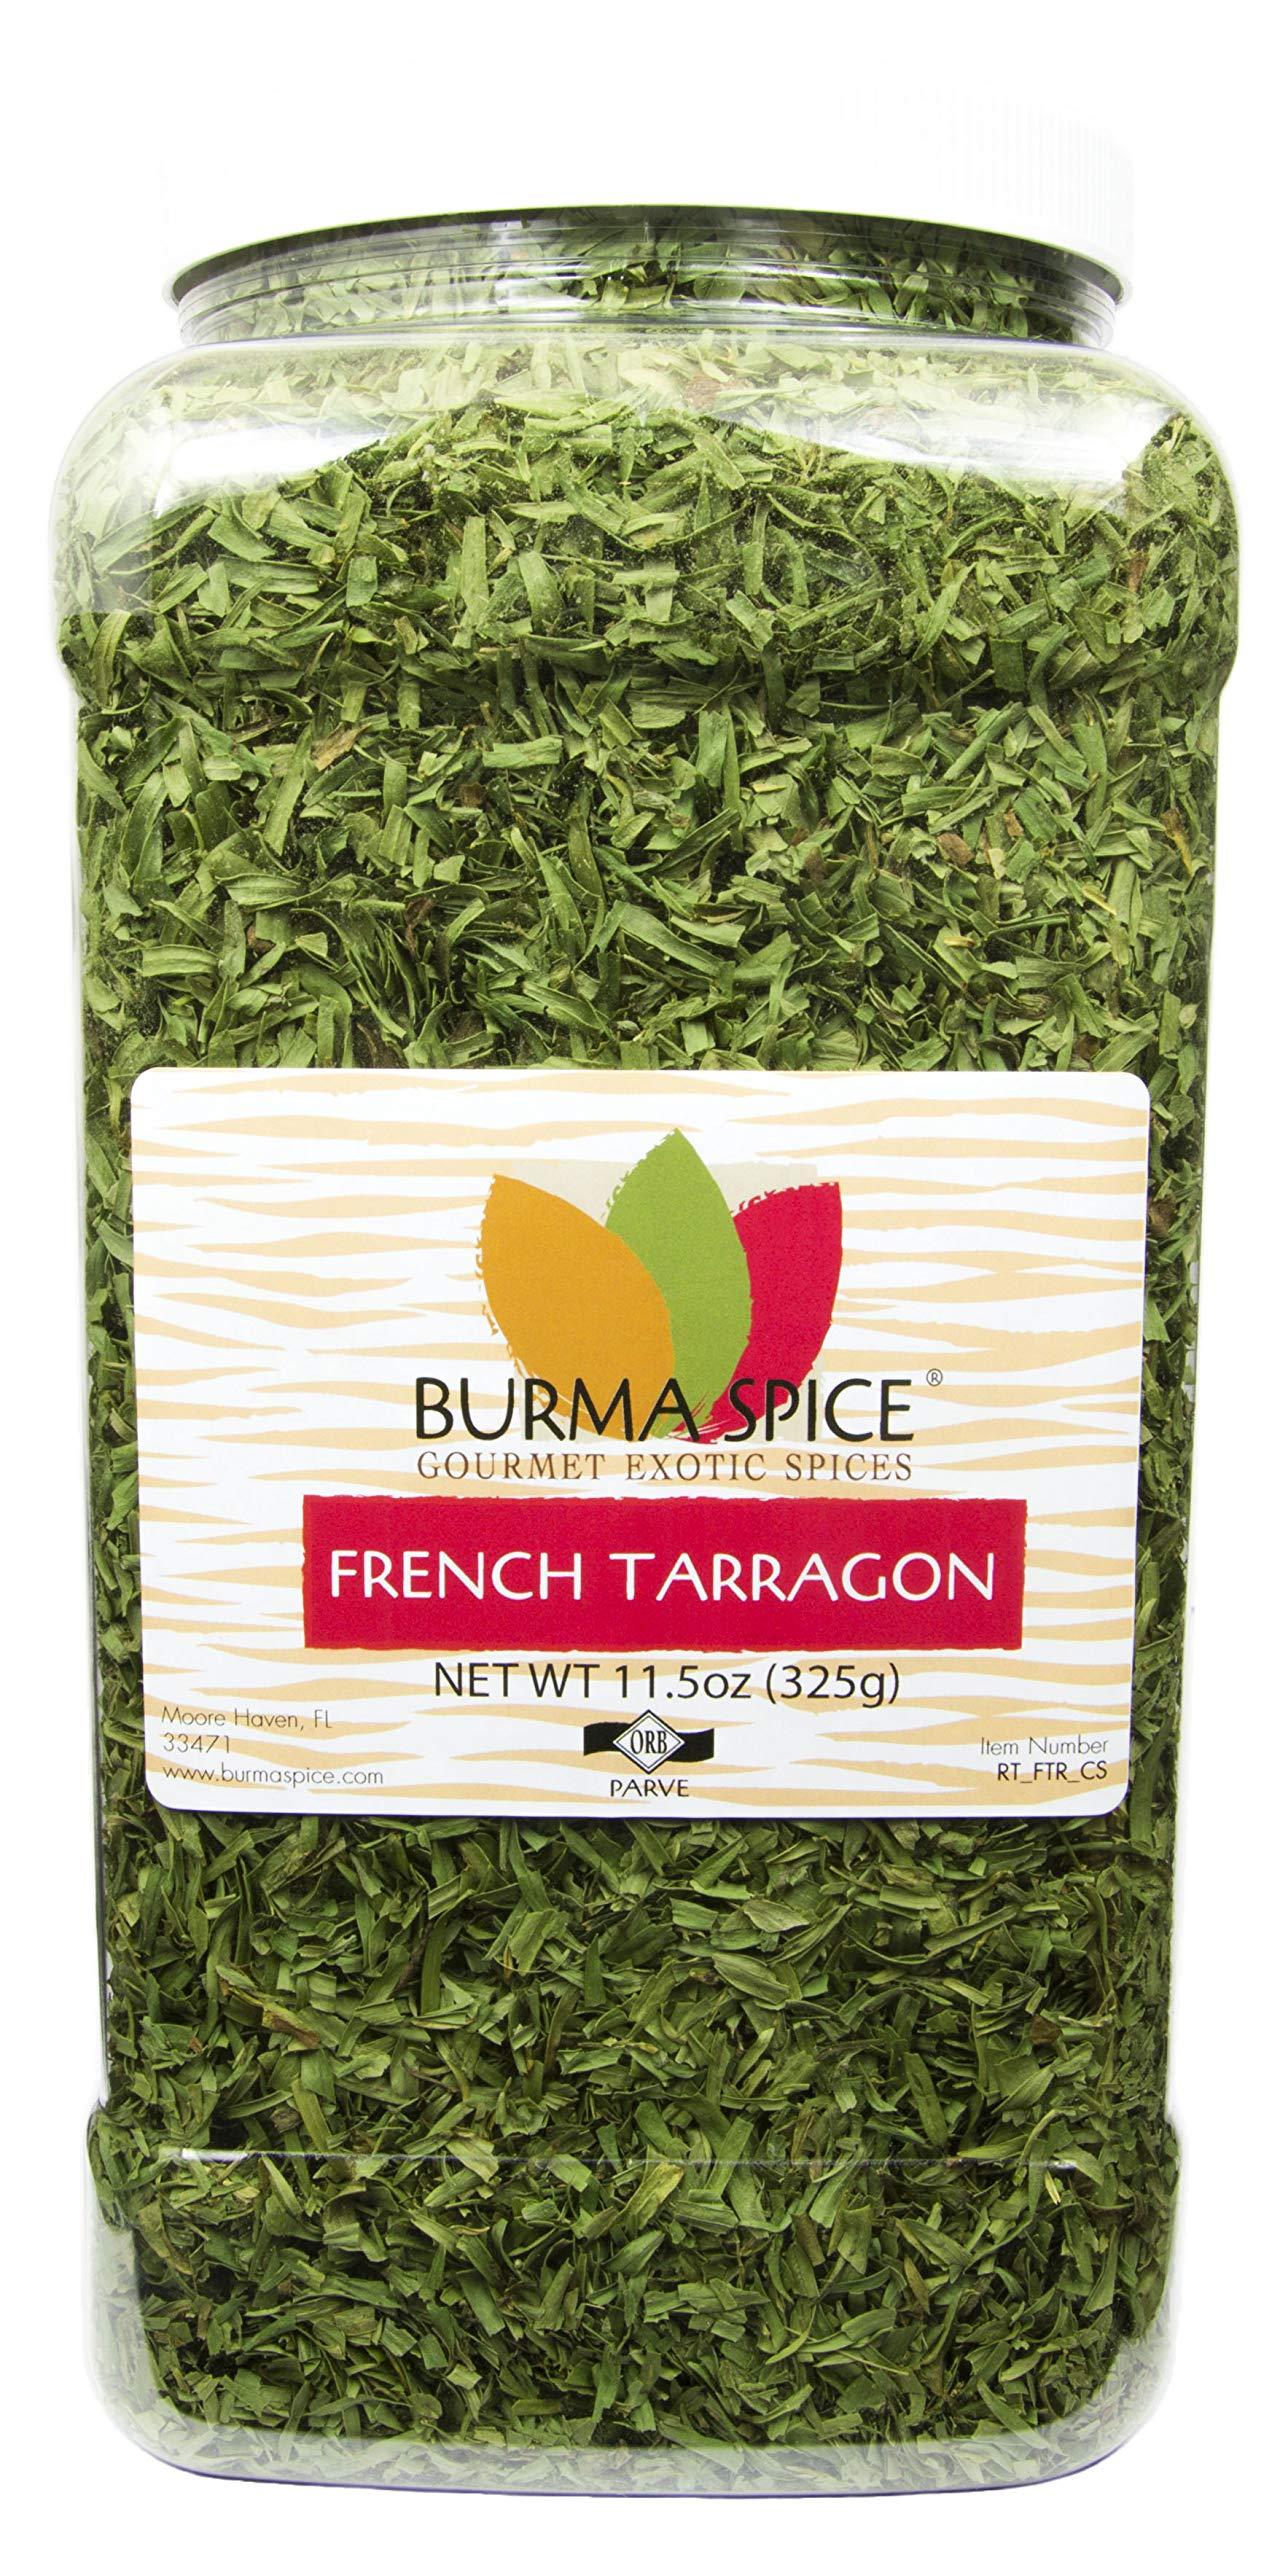 French Tarragon : Dried Herb, No additives, French Cuisine : Kosher (11.5oz.)